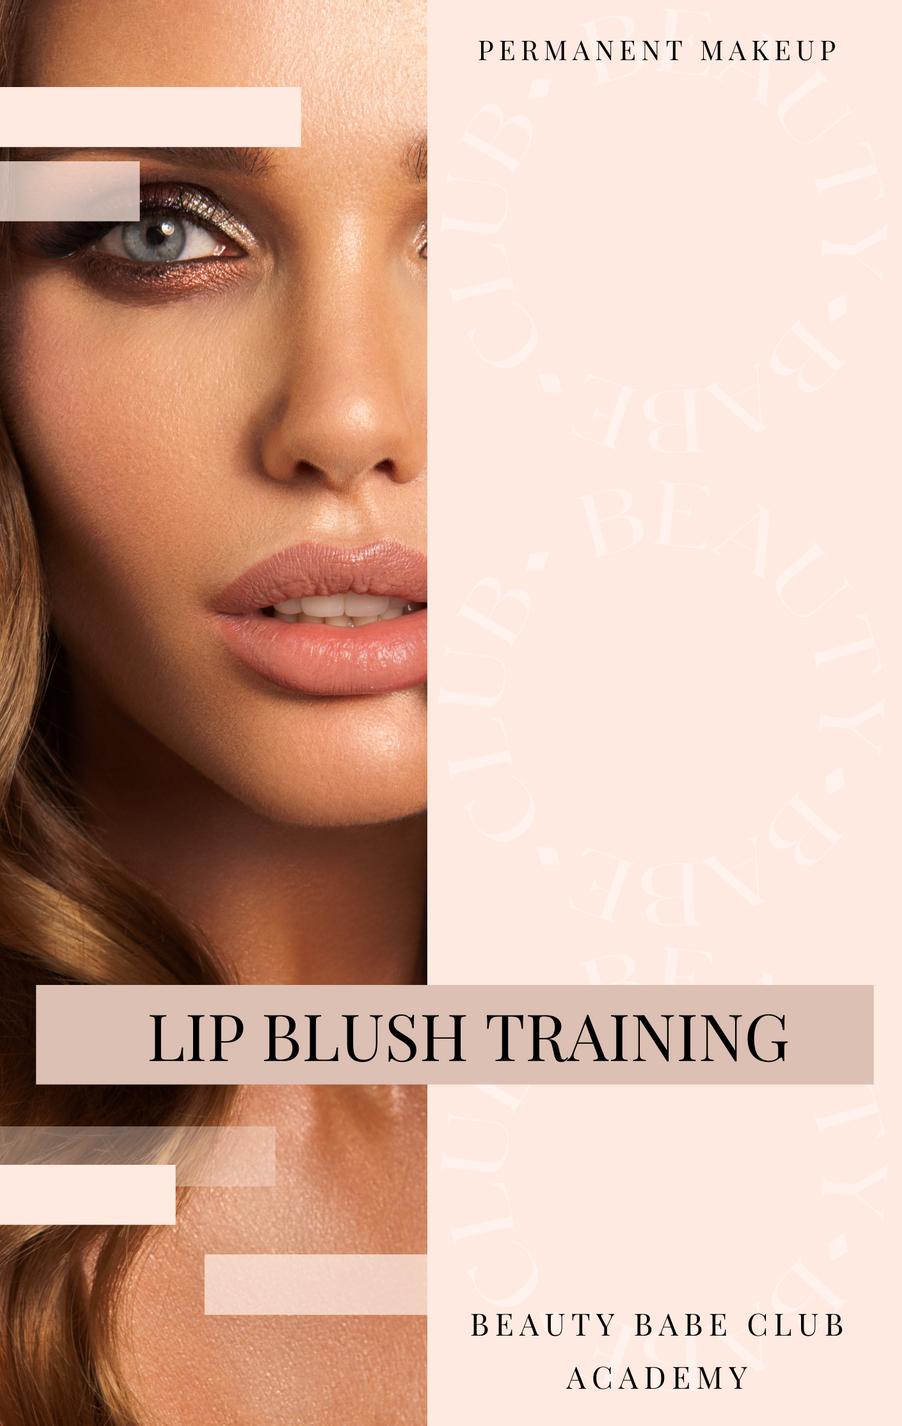 cover-lip-blush-training-bbc-academy